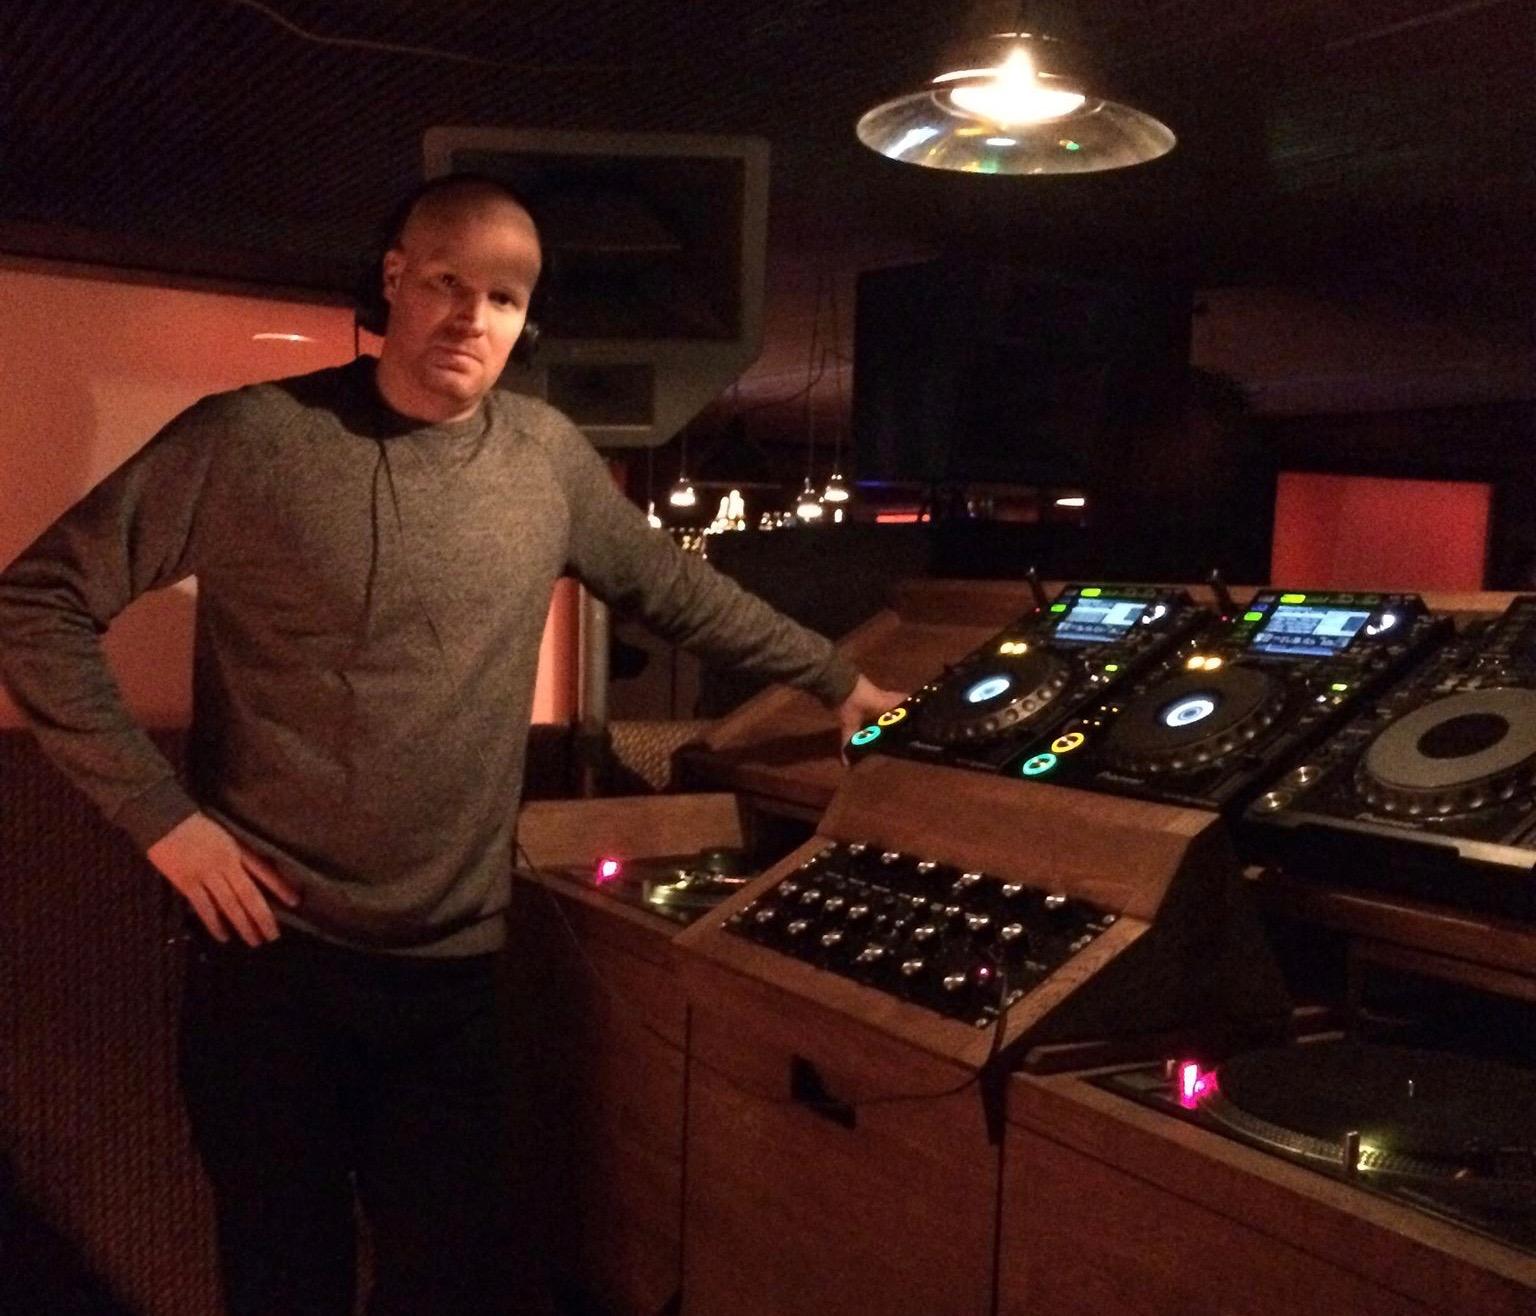 Accidental Dance Music – Øyvind Morken in Profile